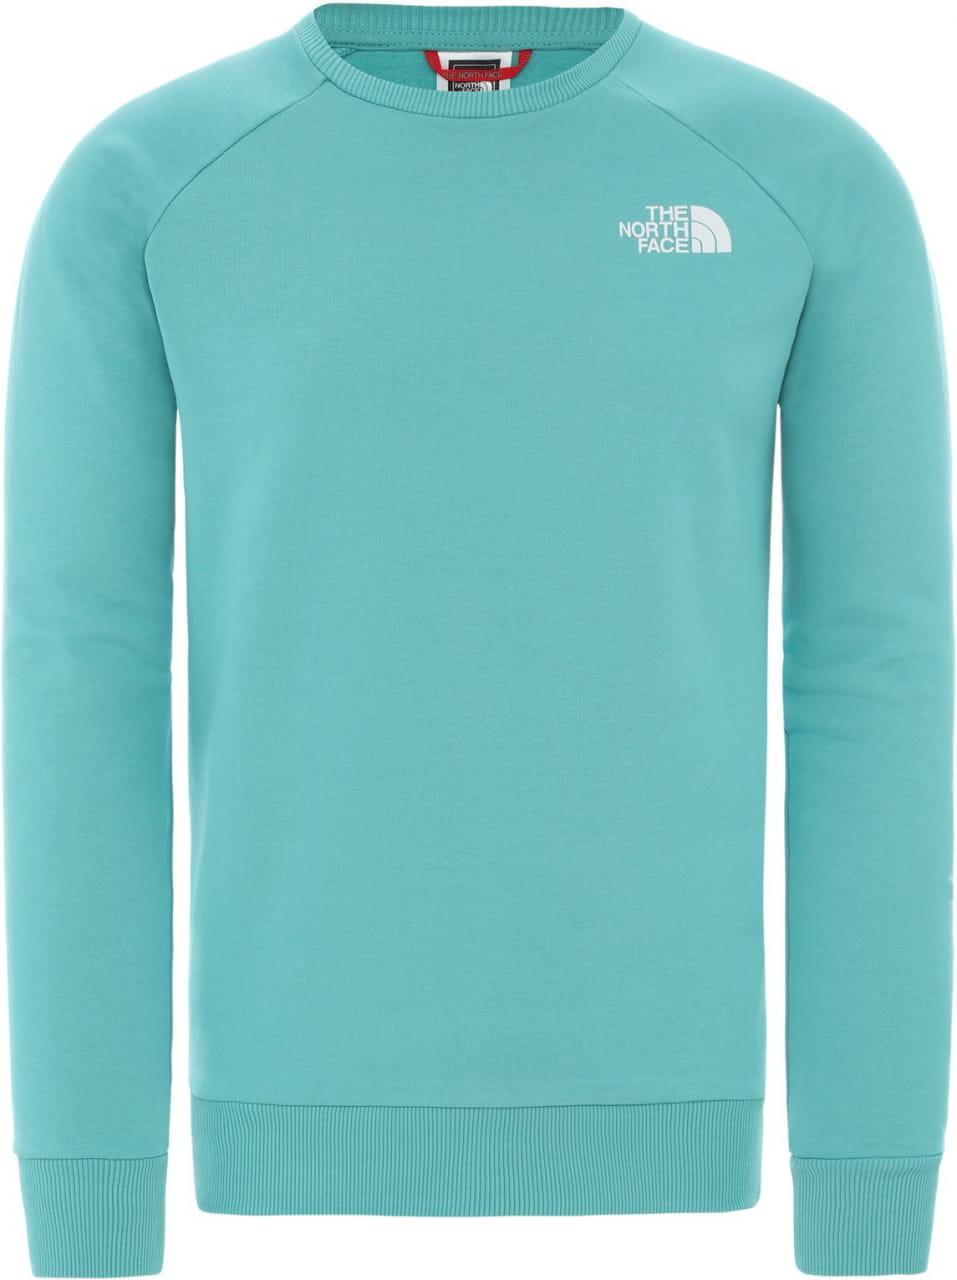 T-Shirts The North Face Men's Raglan Redbox Long-Sleeve T-Shirt